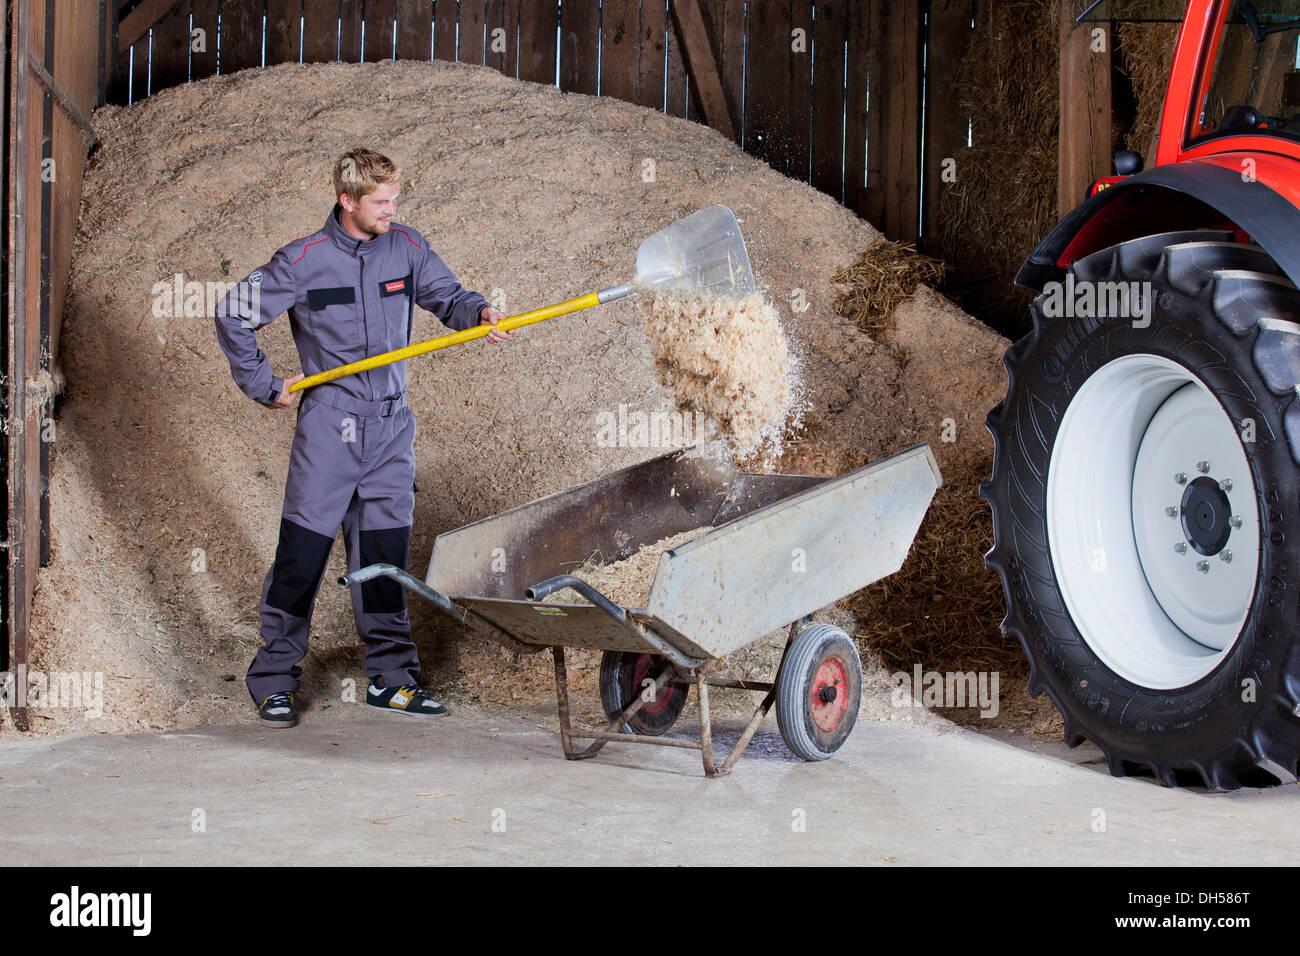 Young man shovelling sawdust into a wheelbarrow, Reith im Alpbachtal, Kufstein District, North Tirol, Tirol, Austria - Stock Image